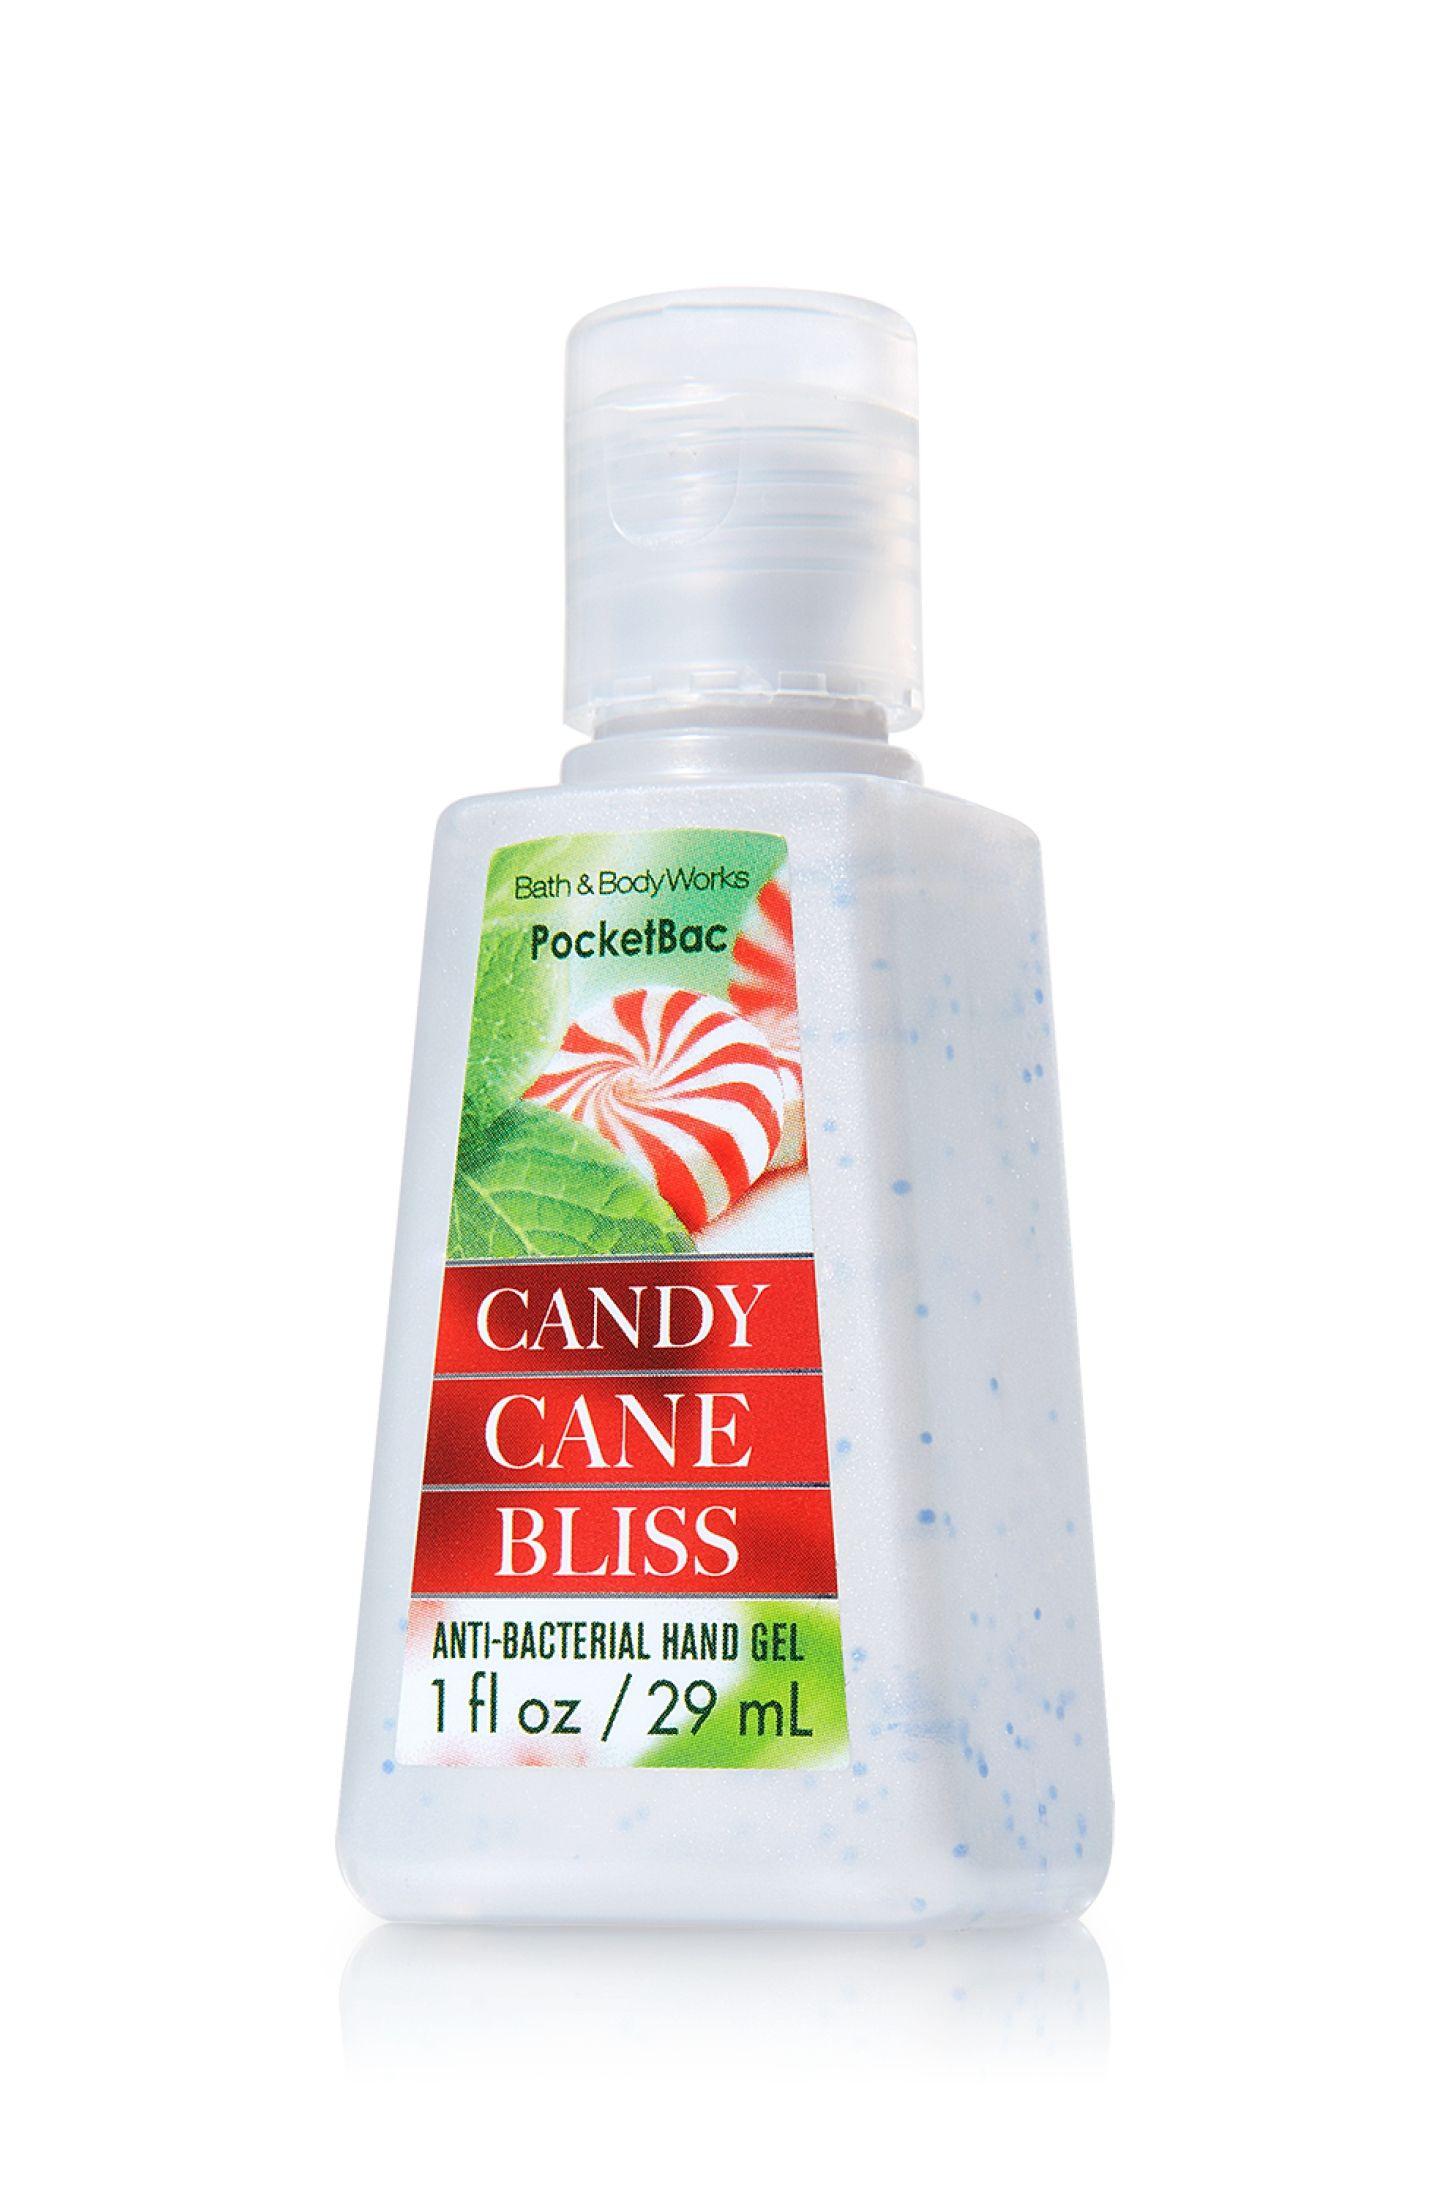 Candy Cane Bliss Pocketbac Sanitizing Hand Gel Anti